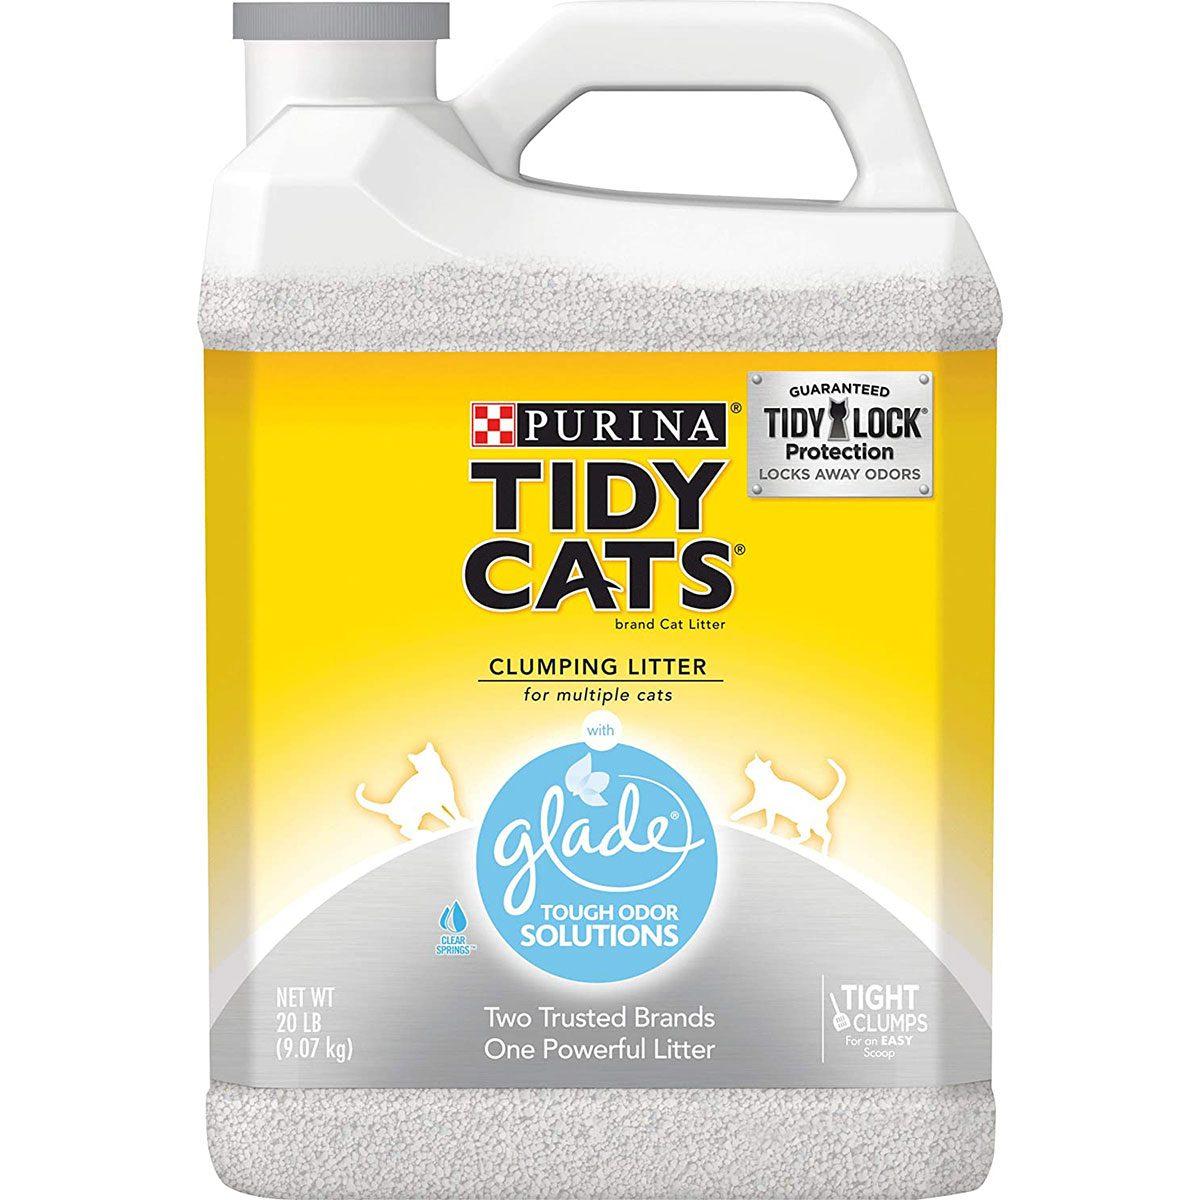 Bottle of Tidy Cats litter